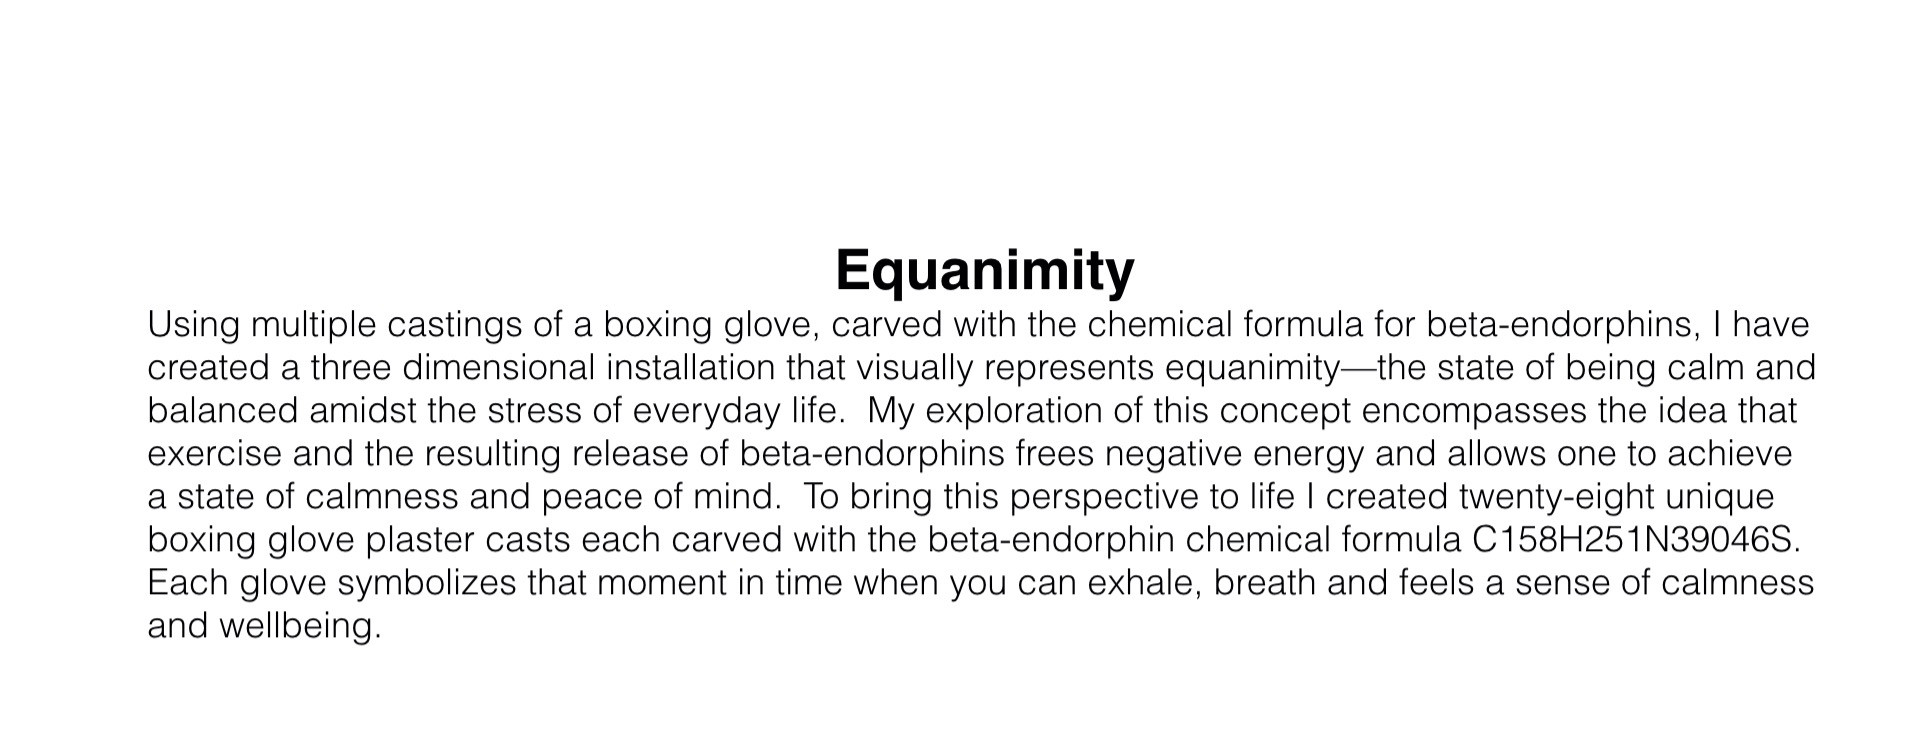 equanimity.jpg